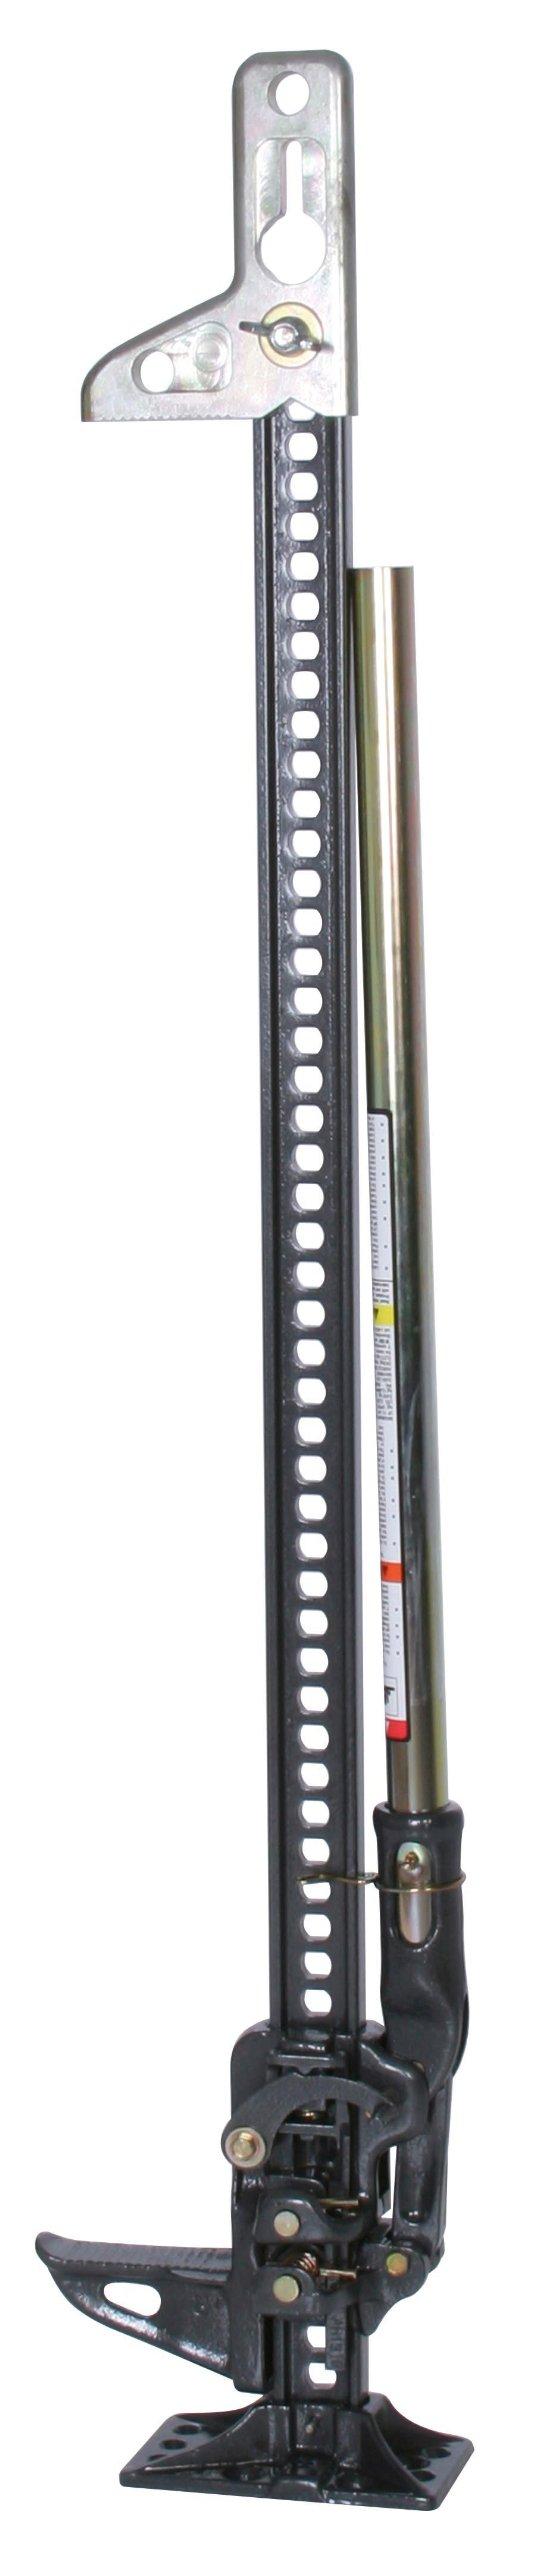 Hi-Lift Jack XT485 48'' Hi-Lift X-TREME Jack